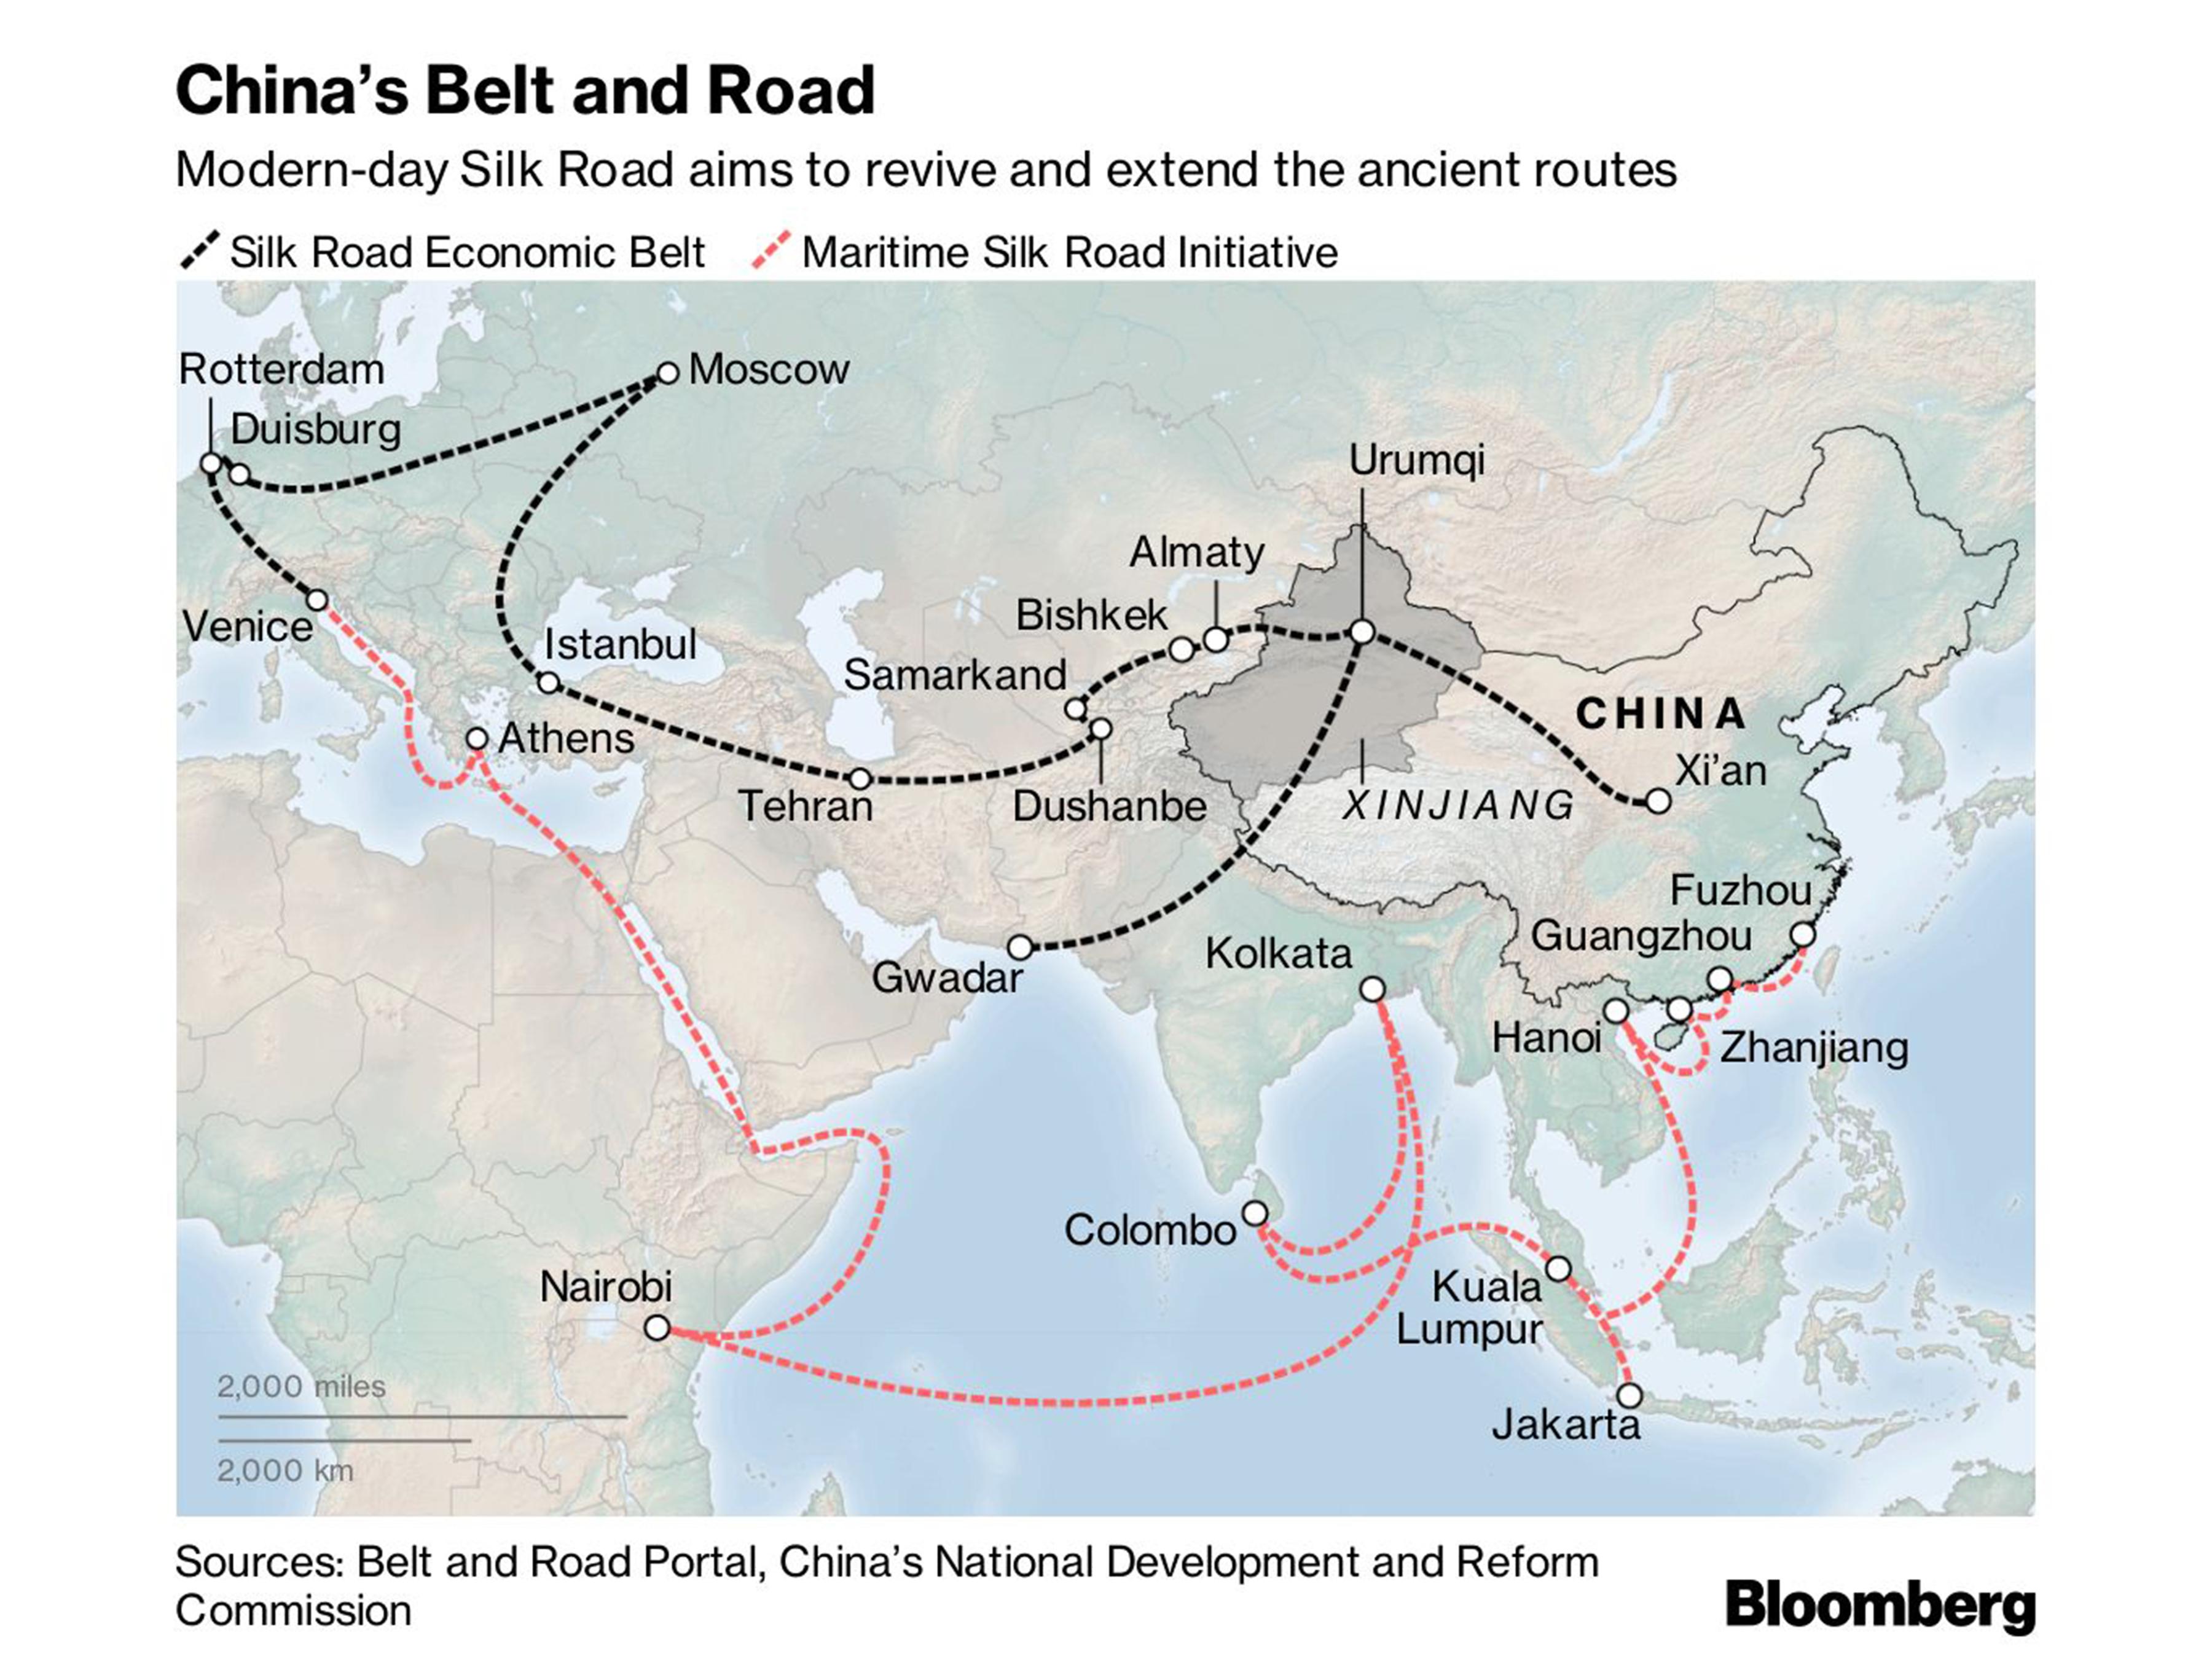 Italy's China Chill Runs Deeper Than Fears Over the Coronavirus